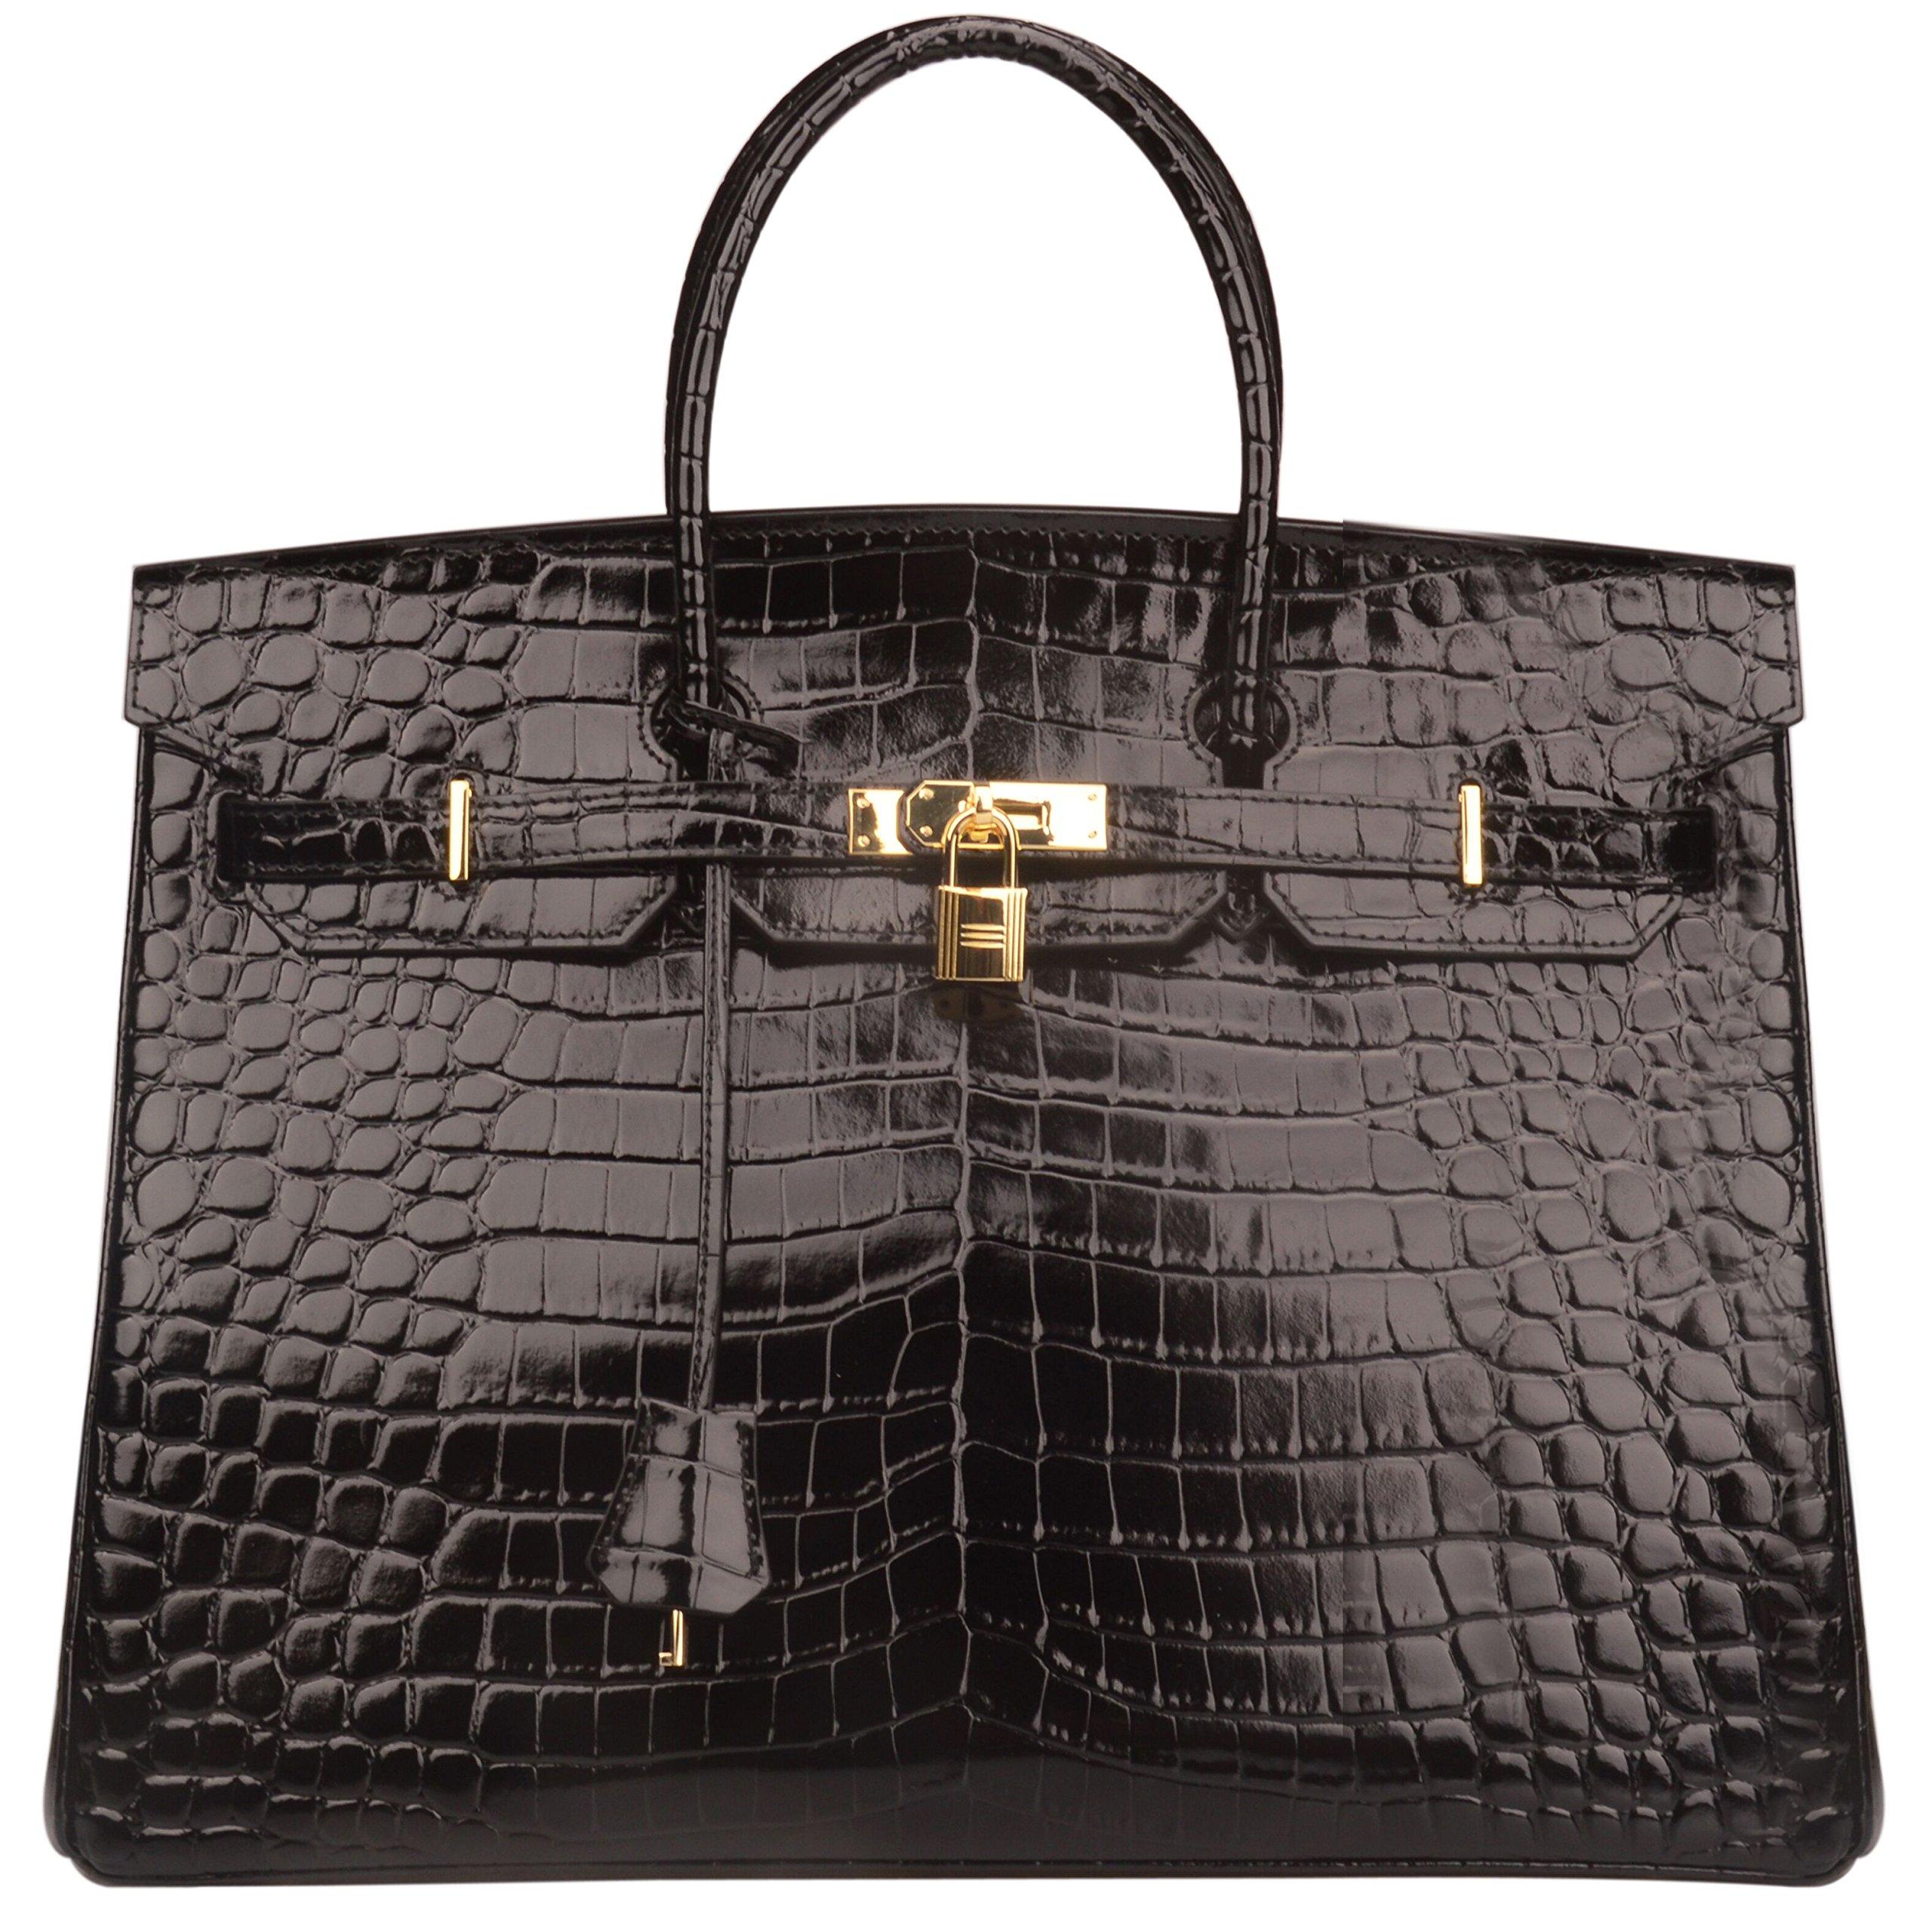 Ainifeel 40cm Oversized Patent Leather Padlock Handbag Business Purse (40cm OVERSIZE, Black)